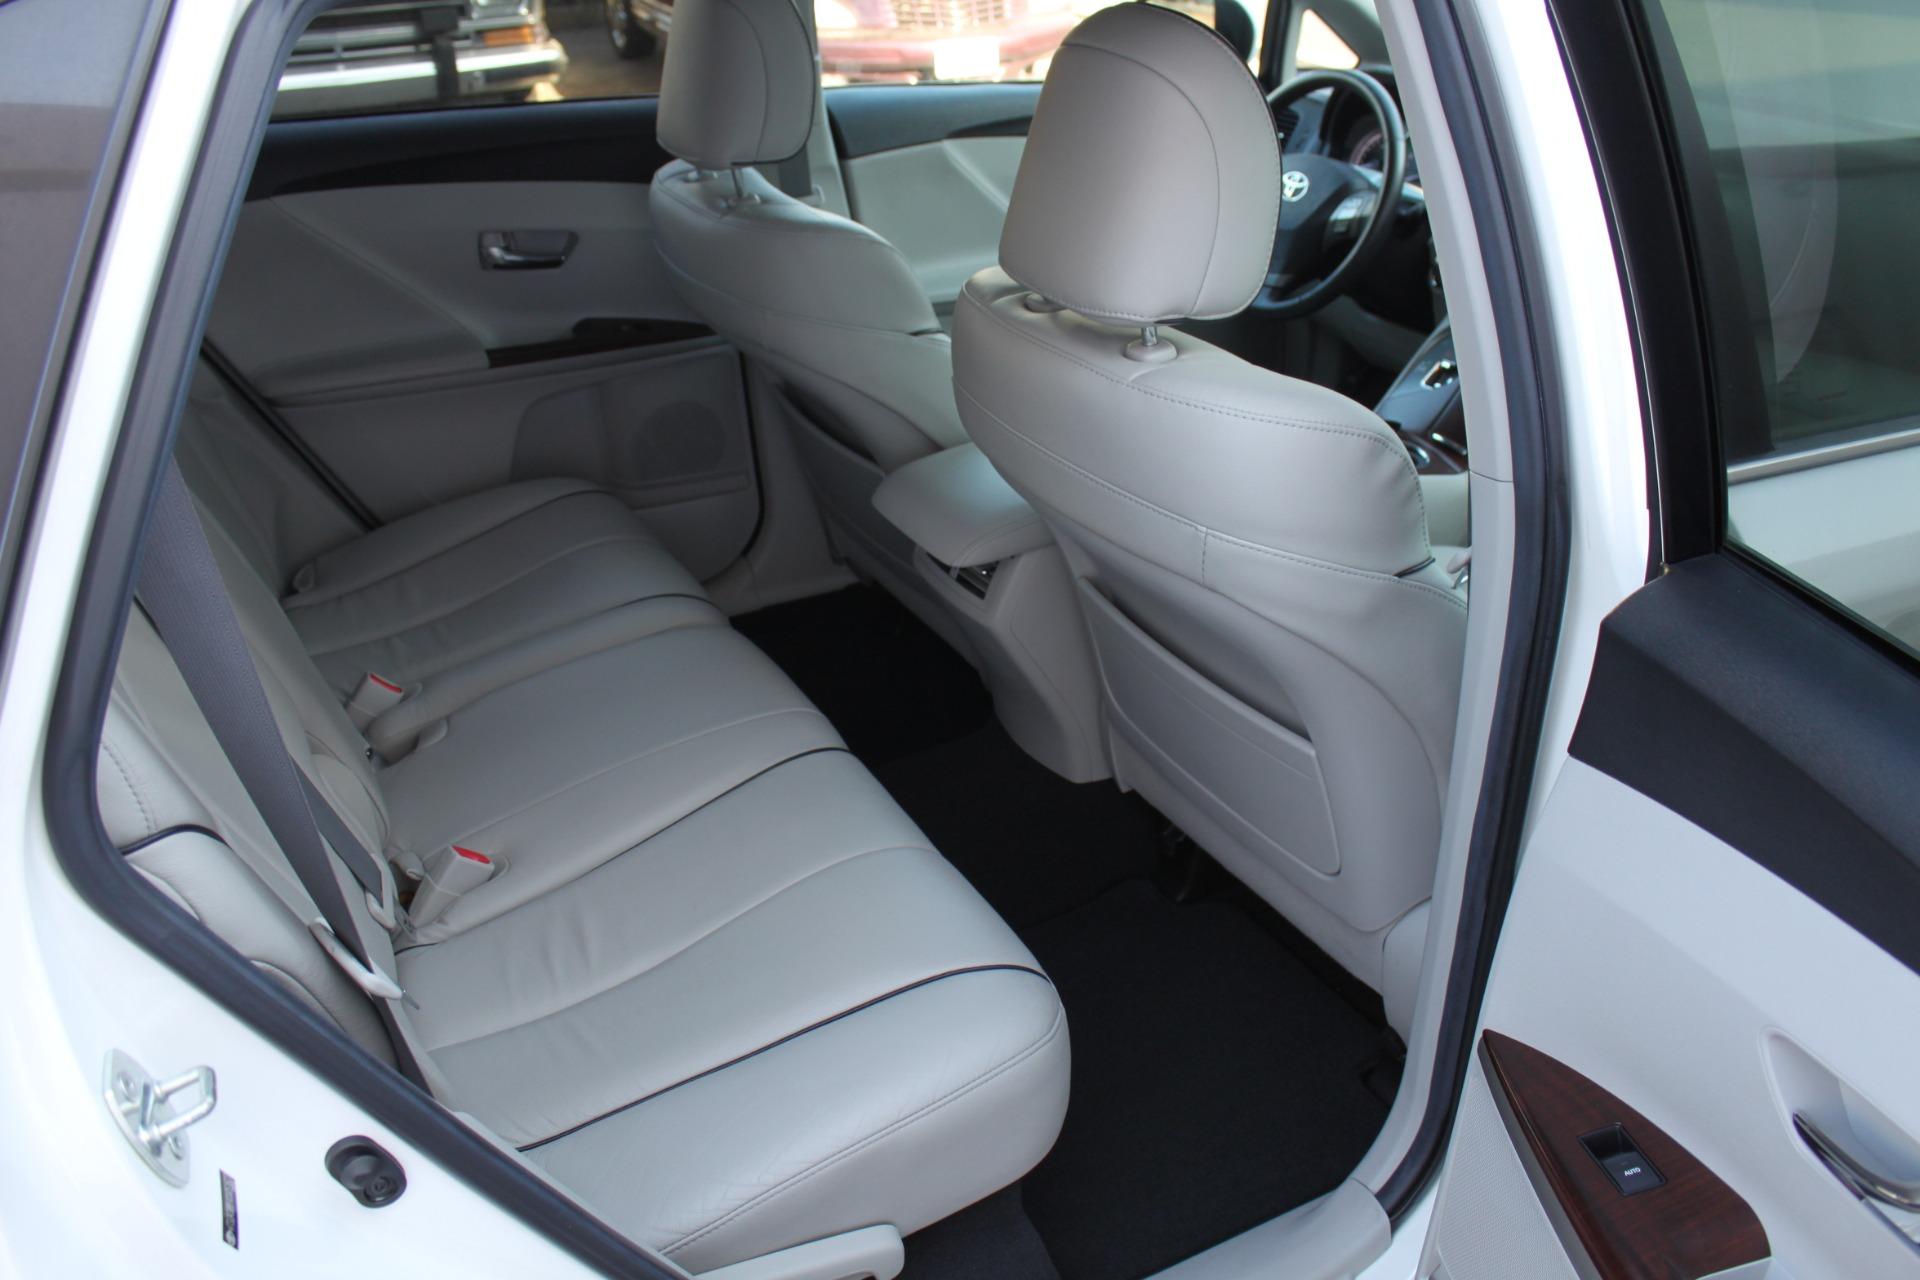 Used-2012-Toyota-Venza-XLE-Acura